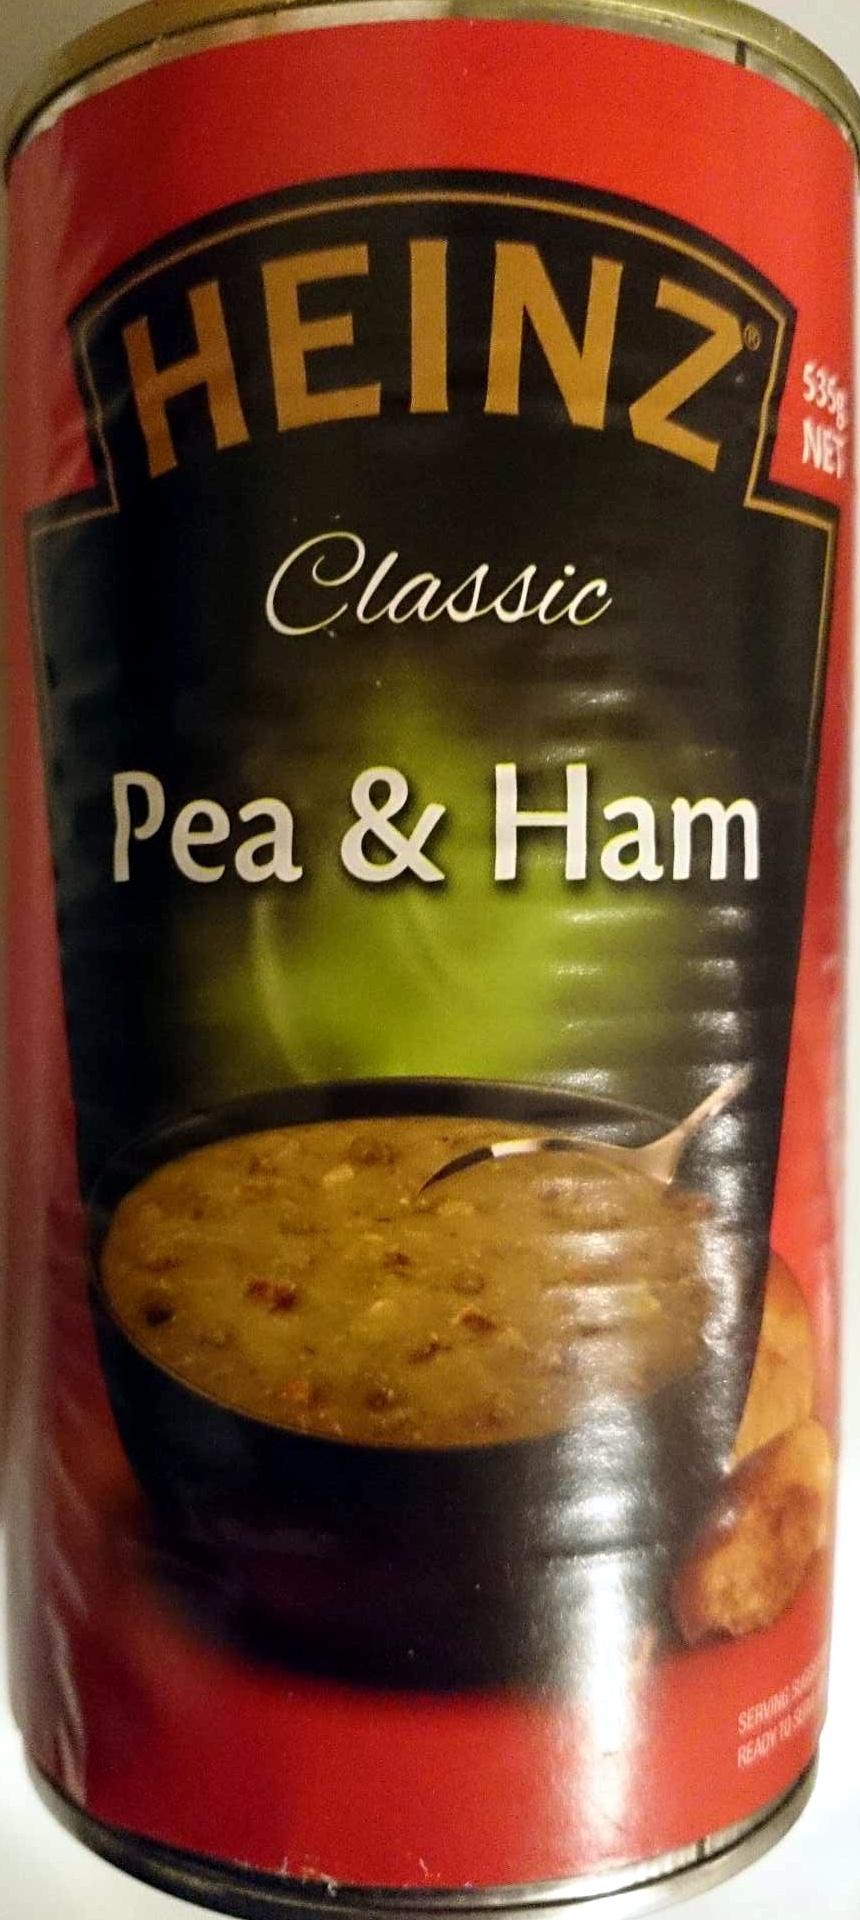 Classic Pea & Ham - Product - en